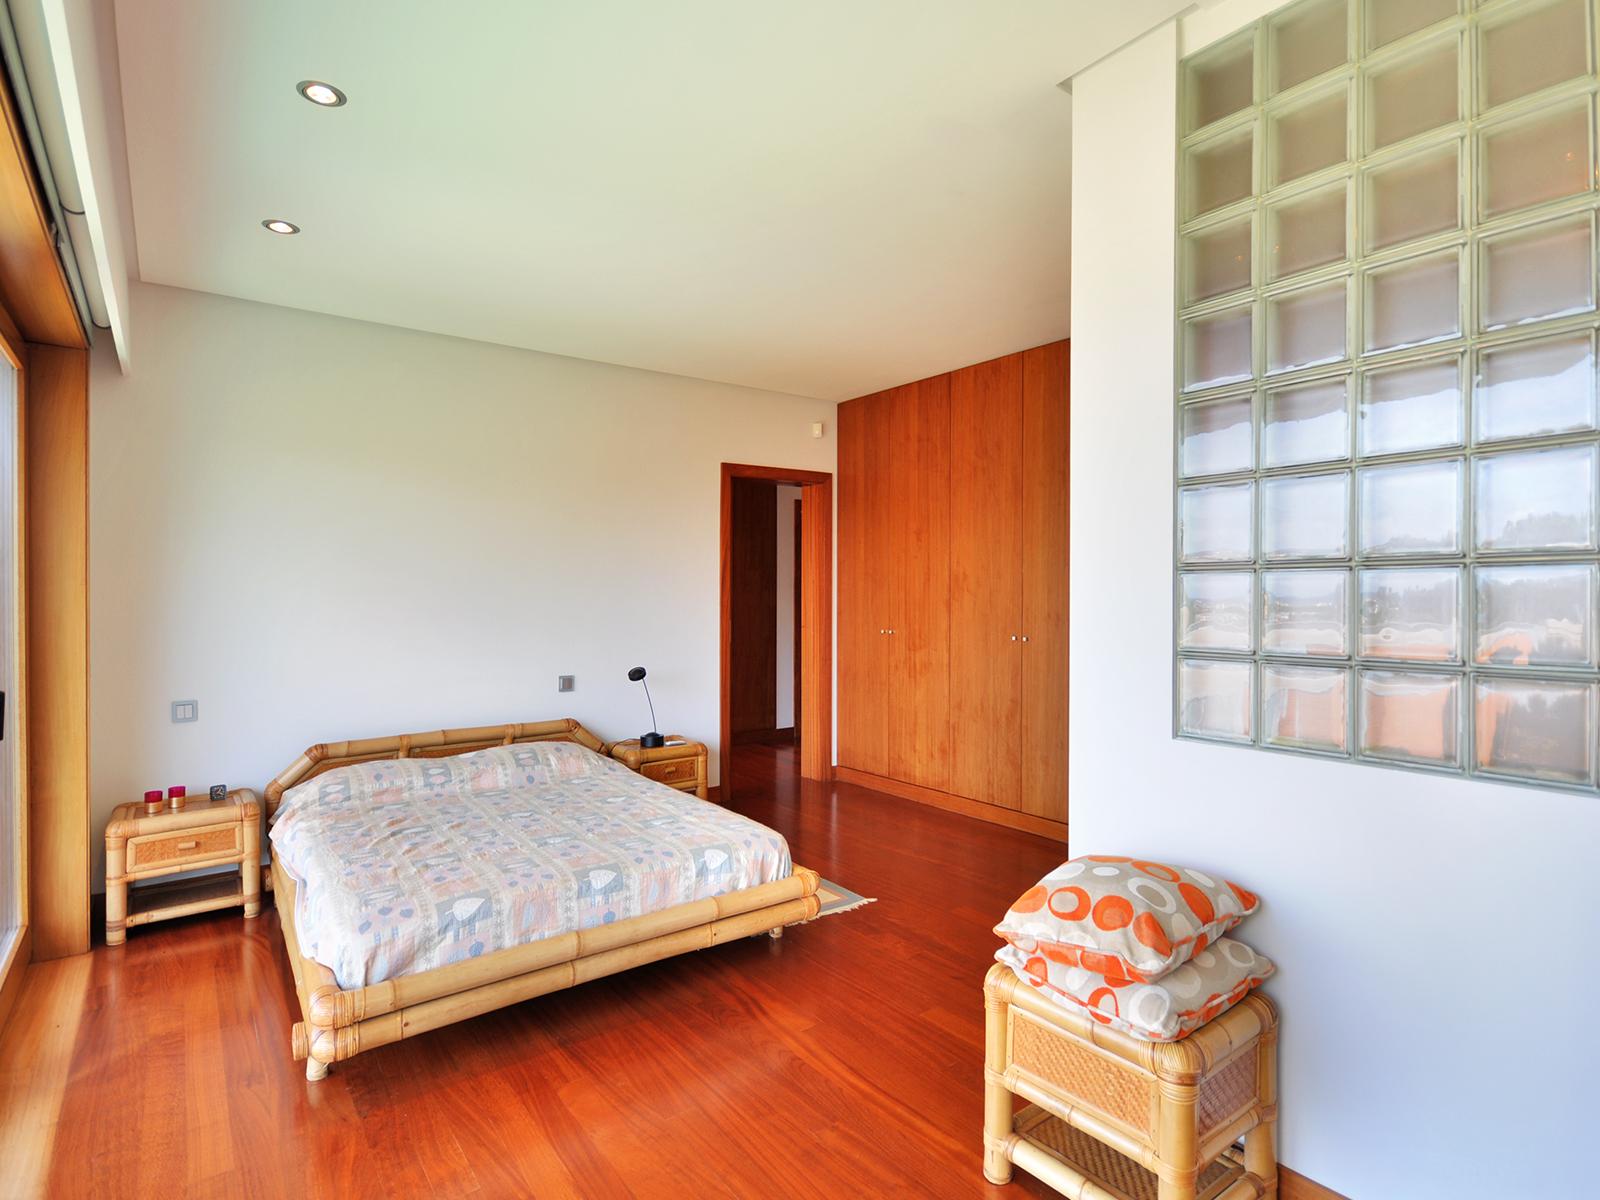 Luxury villa near the beach of Carreço